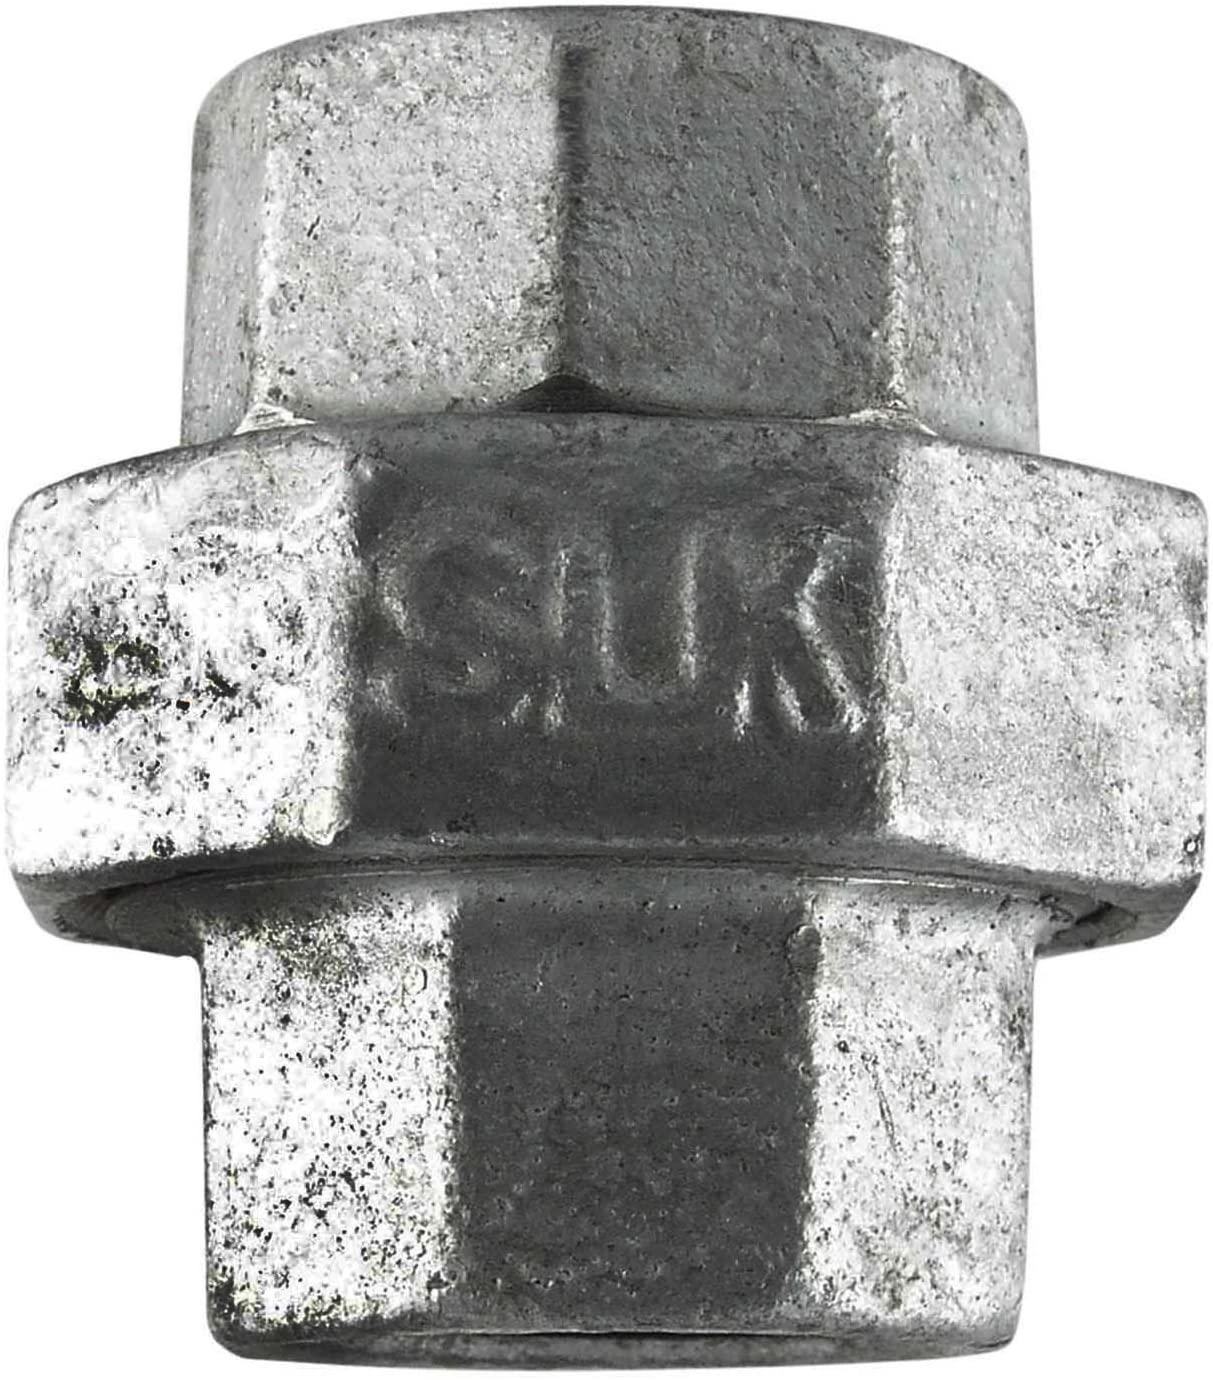 B & K 511-707BG 1-1/2 GALV UNION